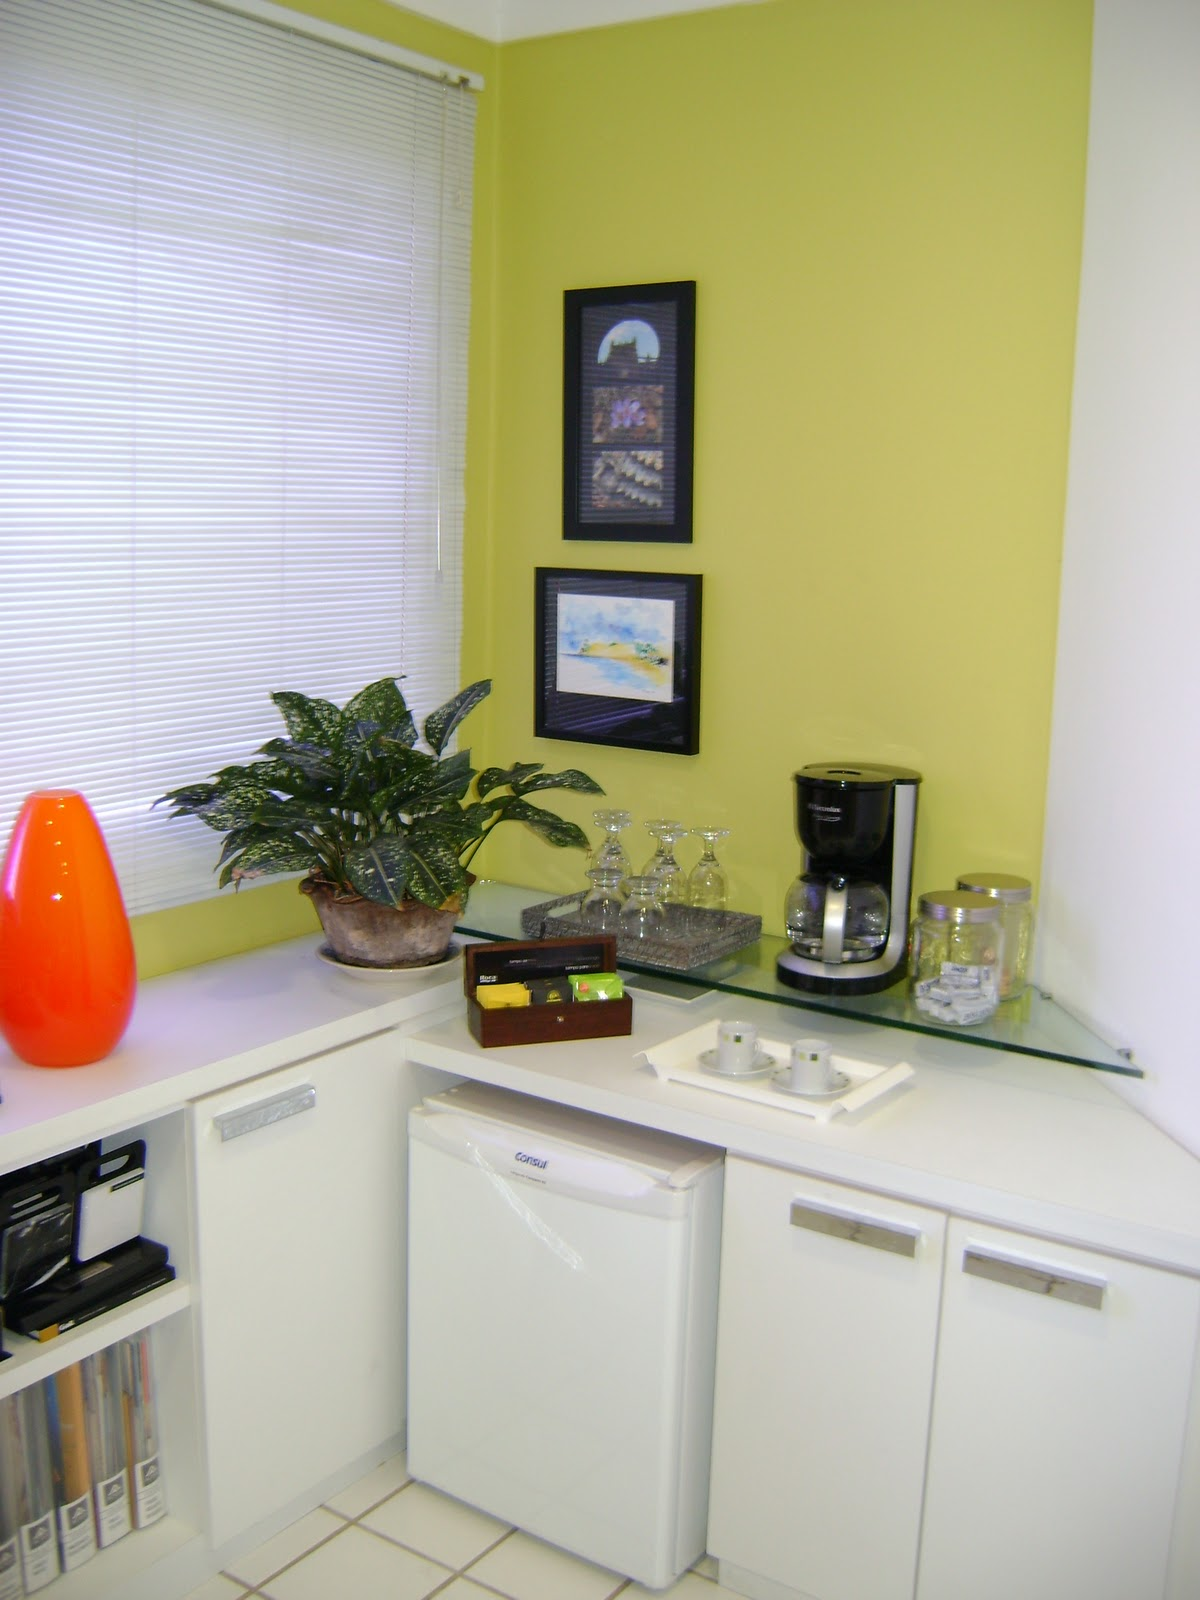 Compre online luminaria de mesa abajur articulavel escritorio flexivel sala trabalho iluminaçao copa leitura estudos luz na amazon. Arquitetando A Nossa Copa